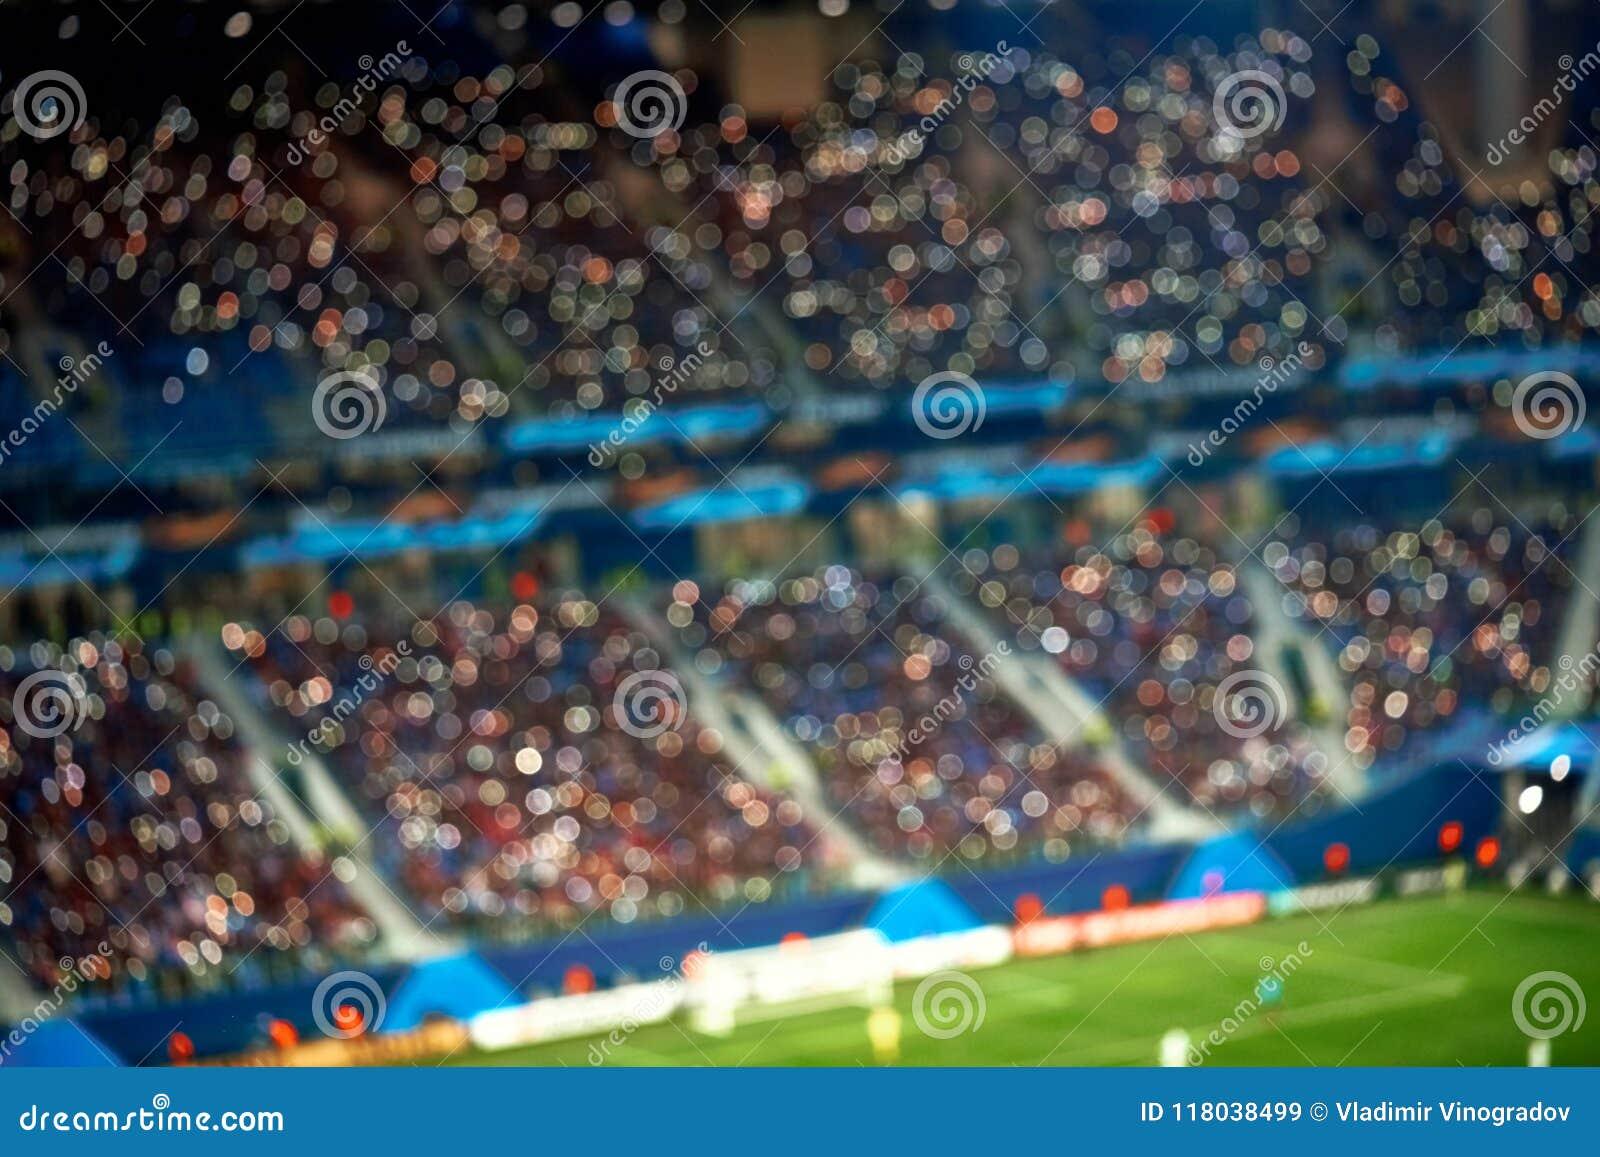 Full football soccer stadium tribunes with lights. Soft focus blurred background